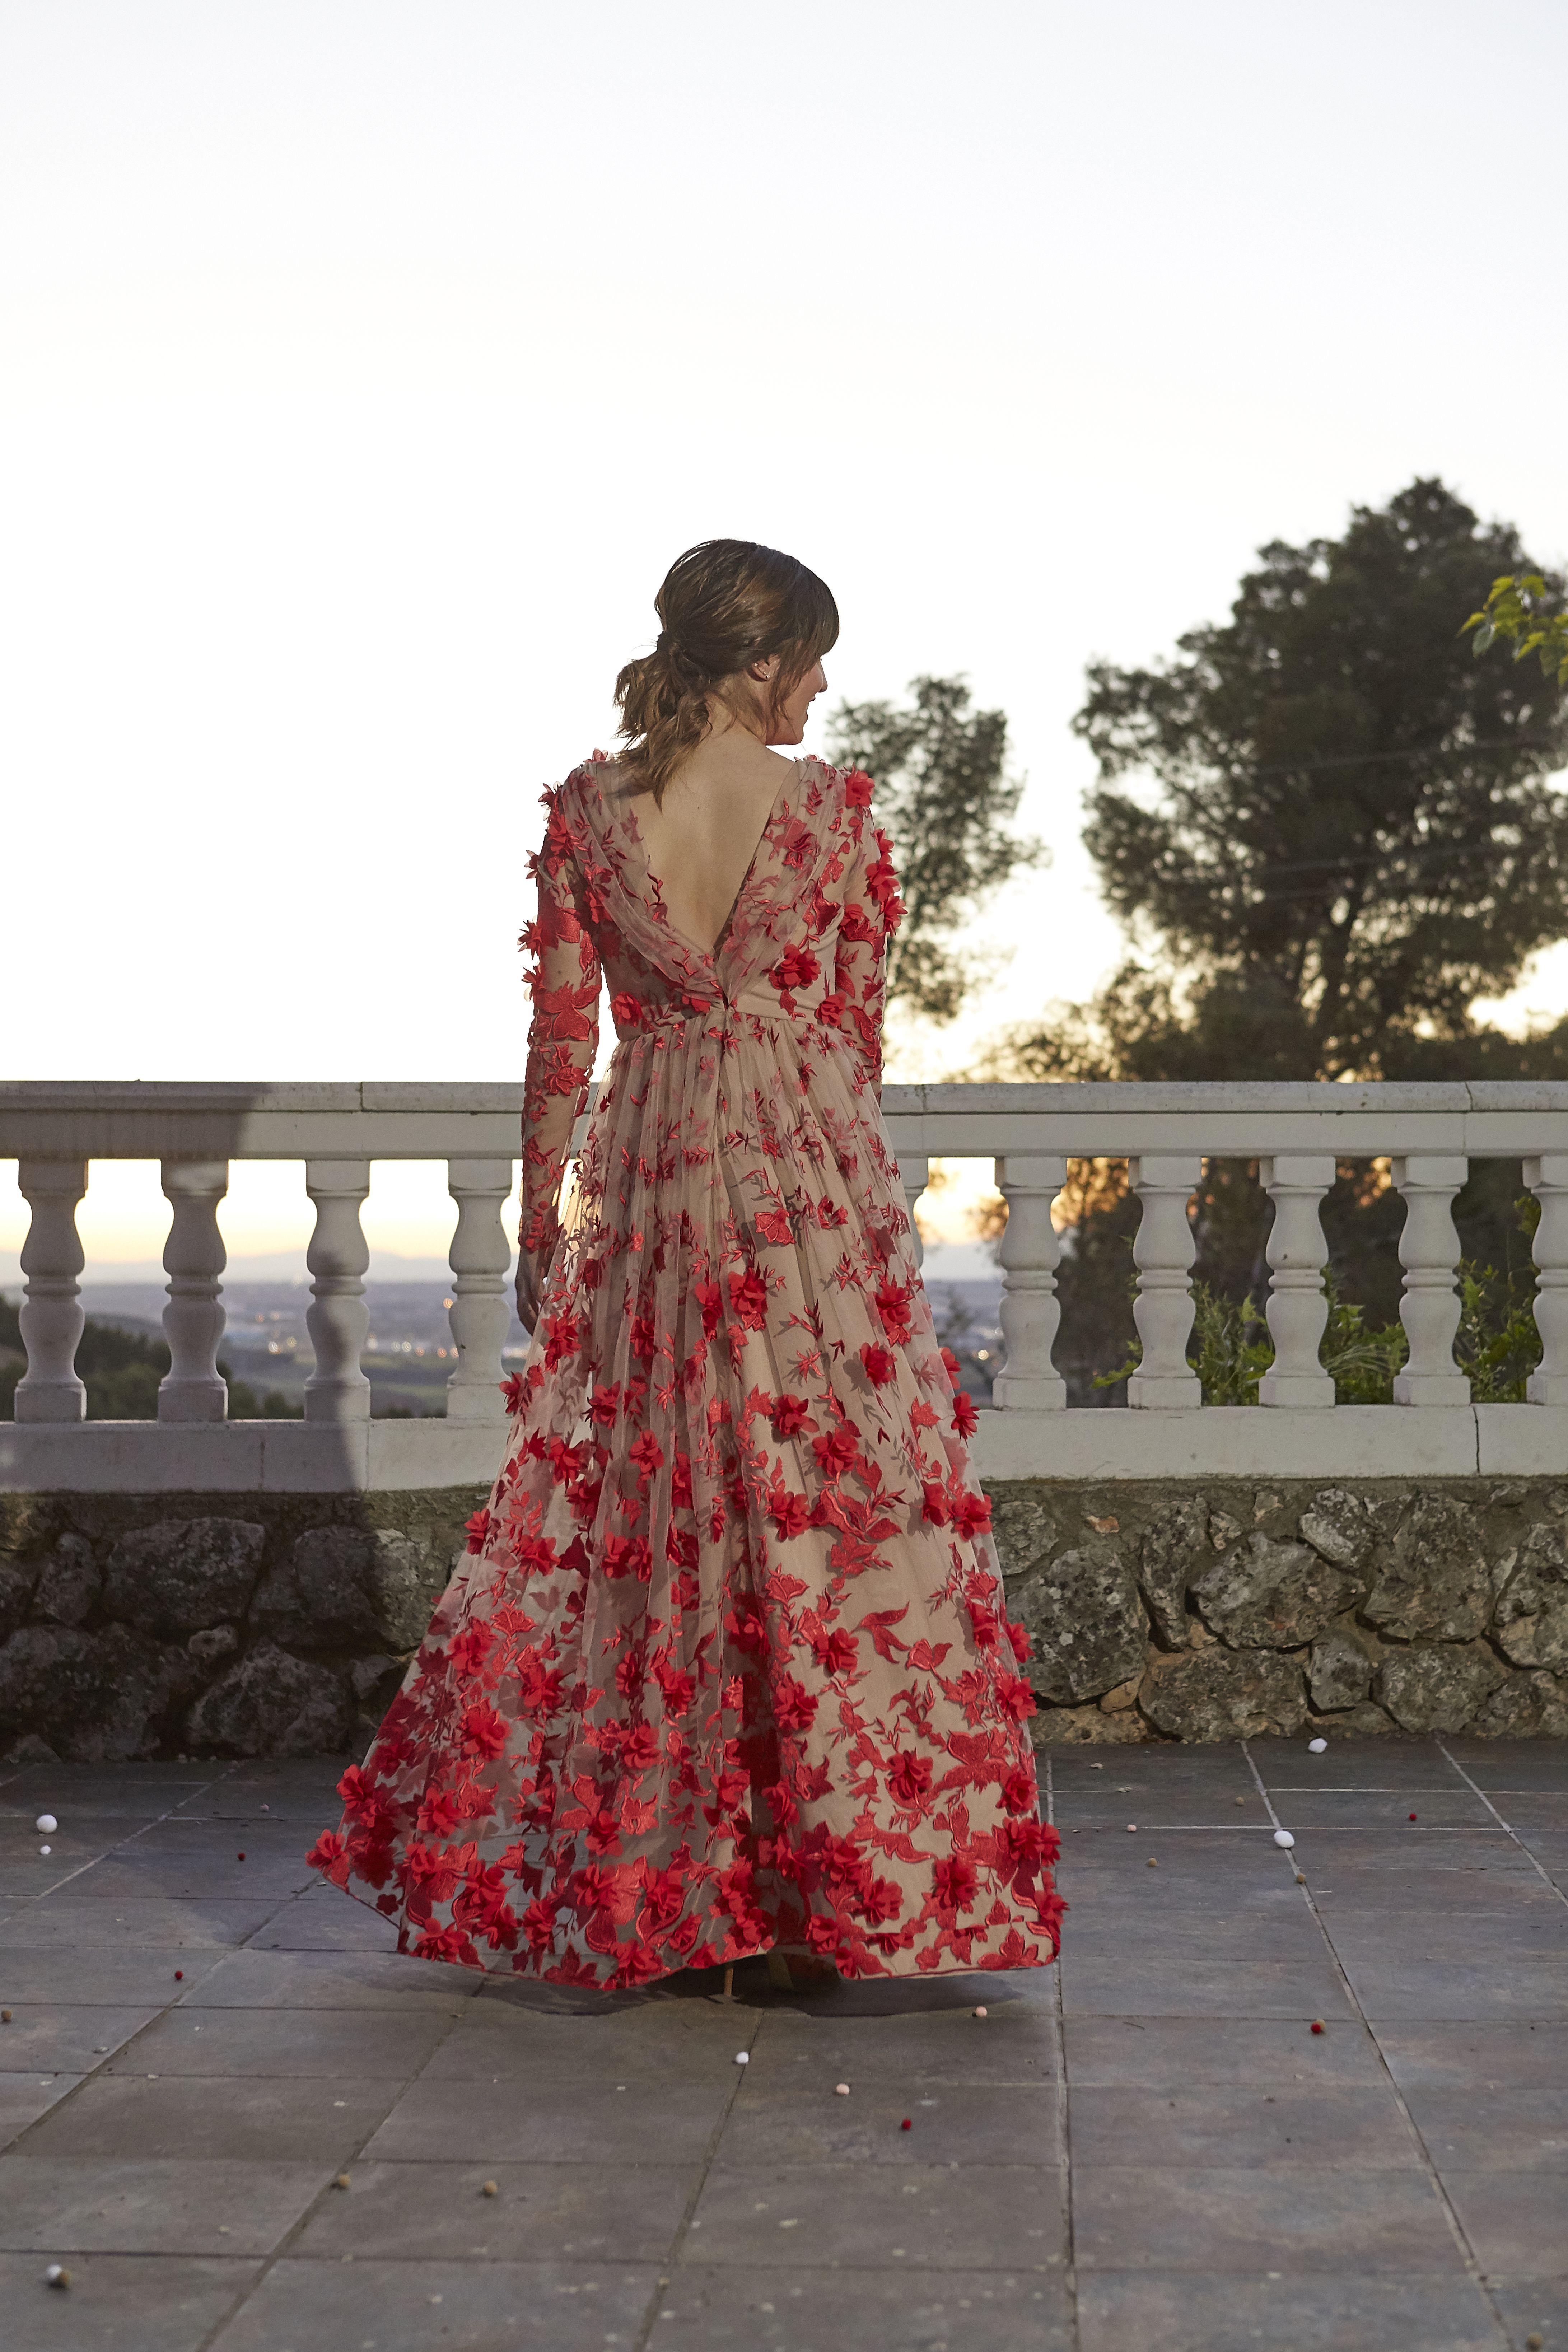 Vestido De Invitada Boda De Tarde 2020 Vestidos Con Tul Bordado Vestidos De Novia Vestido Tul